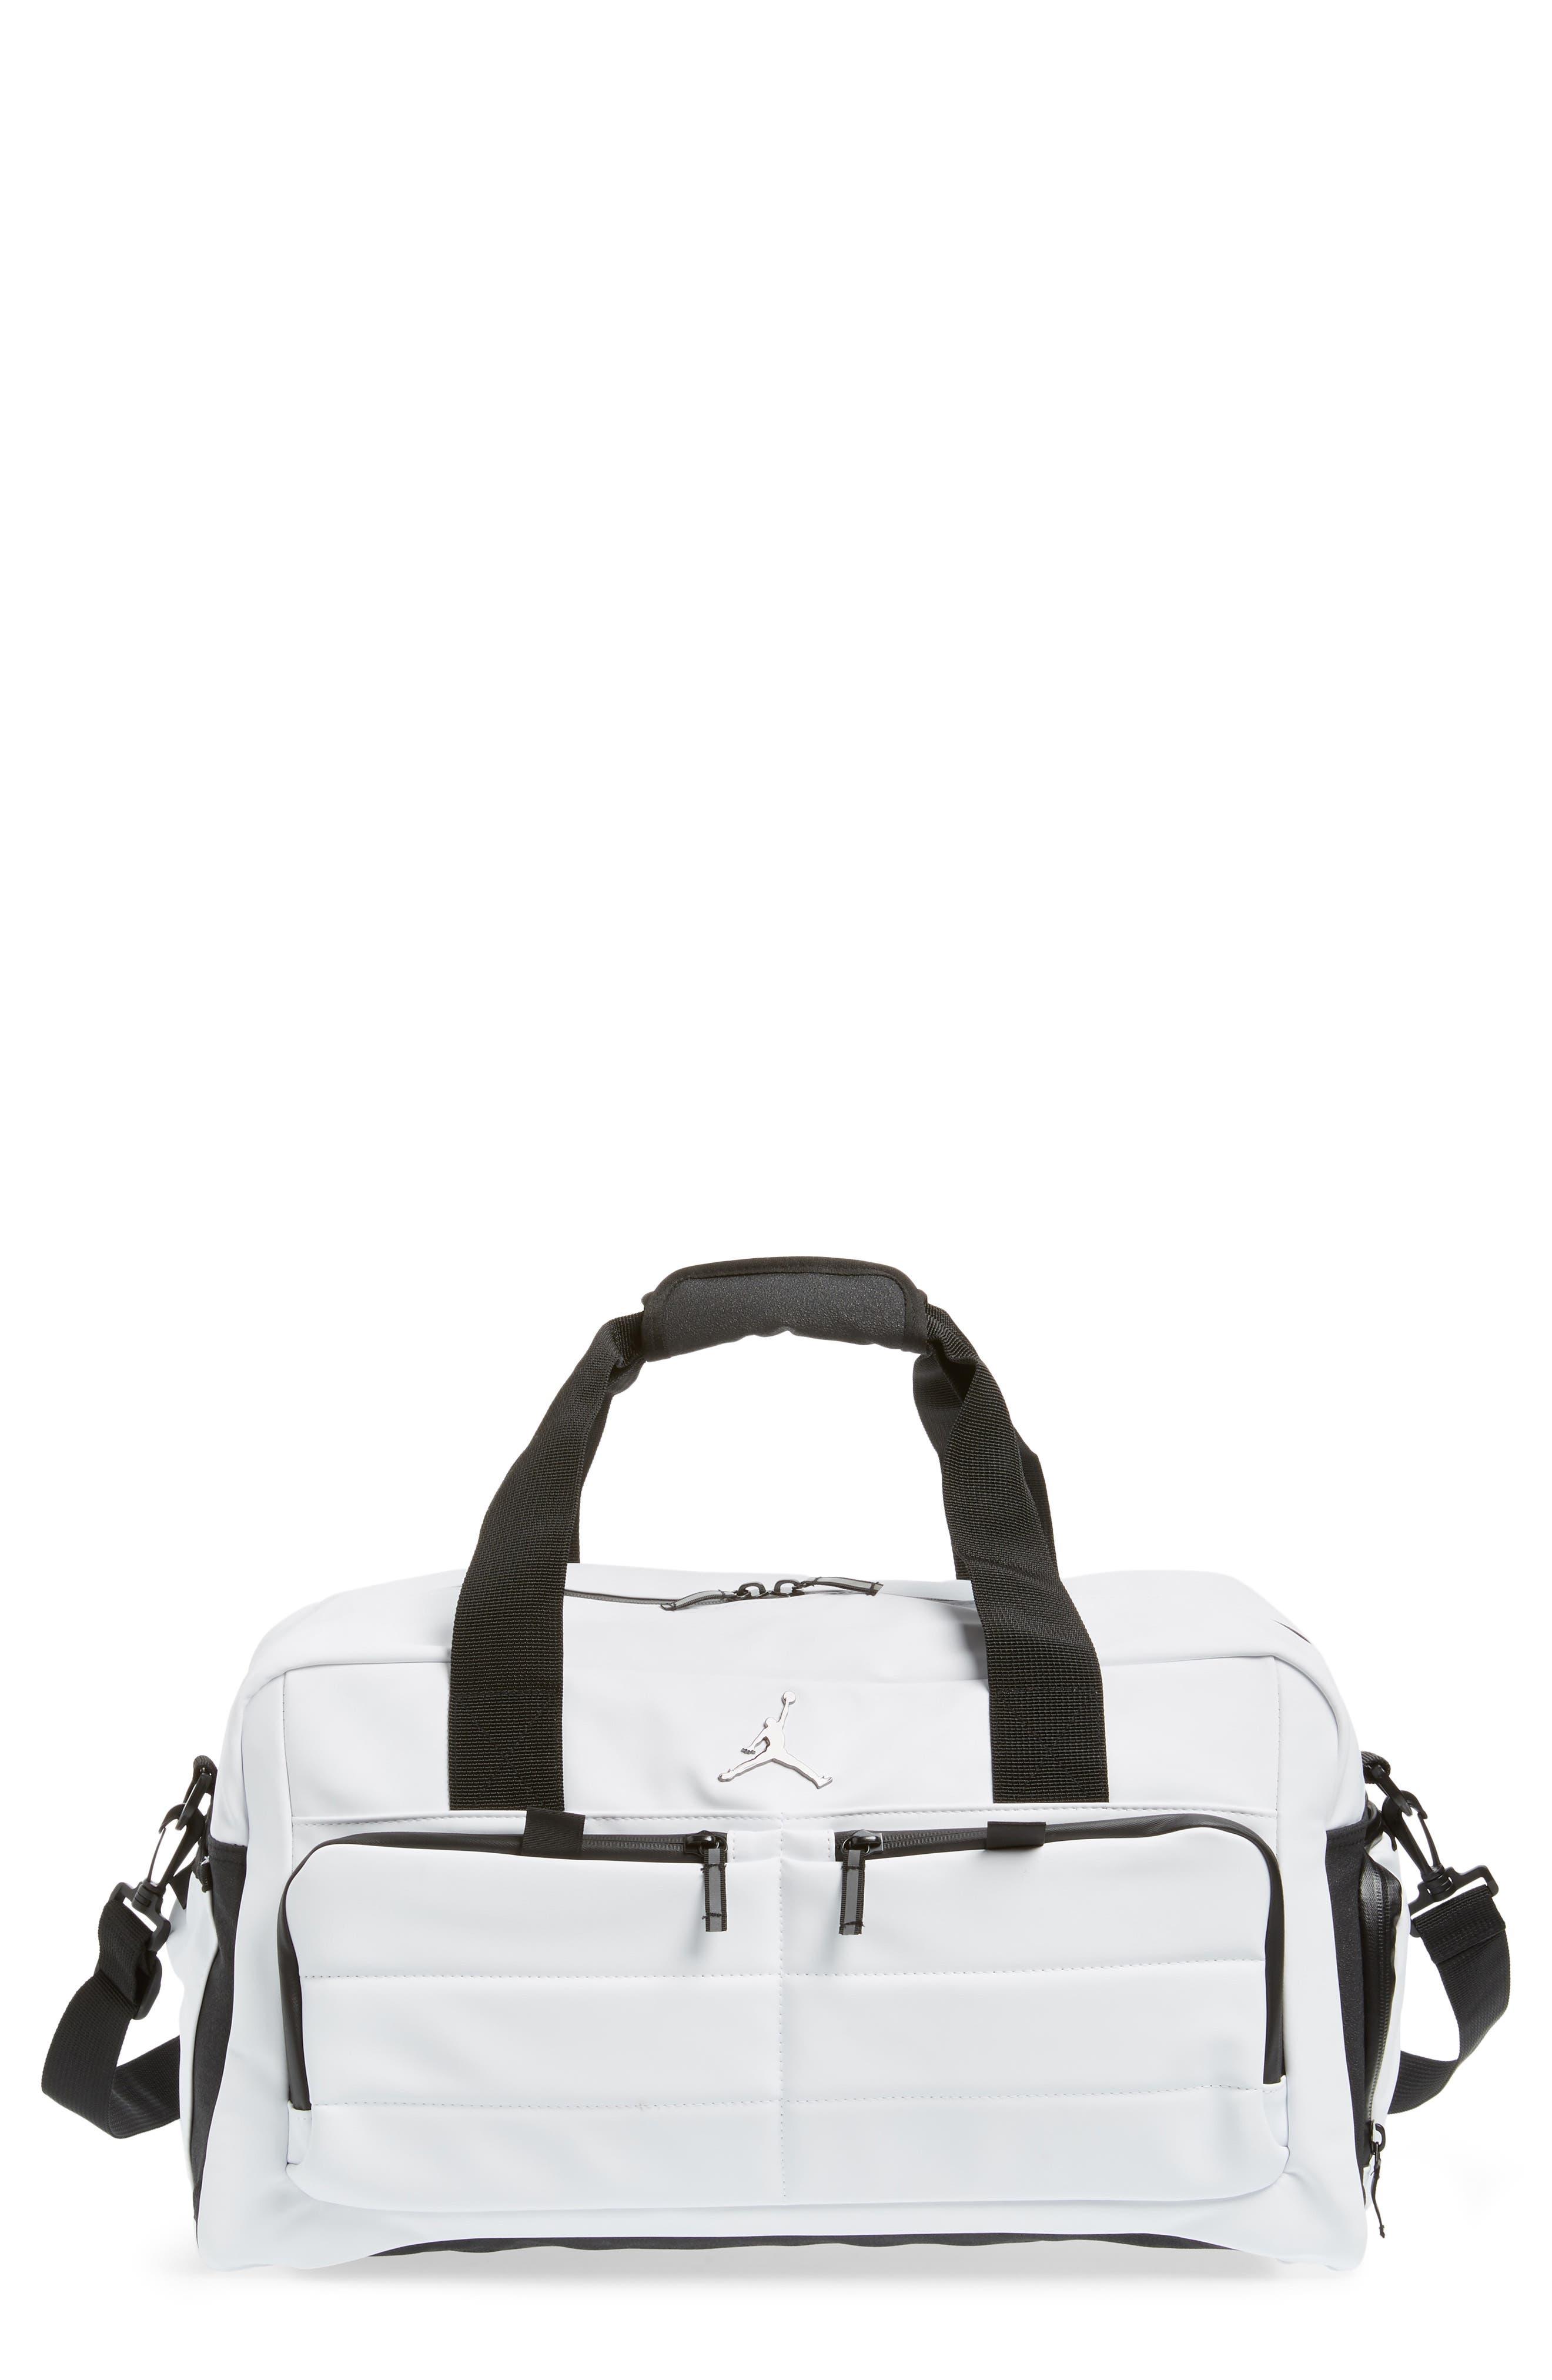 Jordan All World Edition Duffel Bag,                             Main thumbnail 1, color,                             WHITE